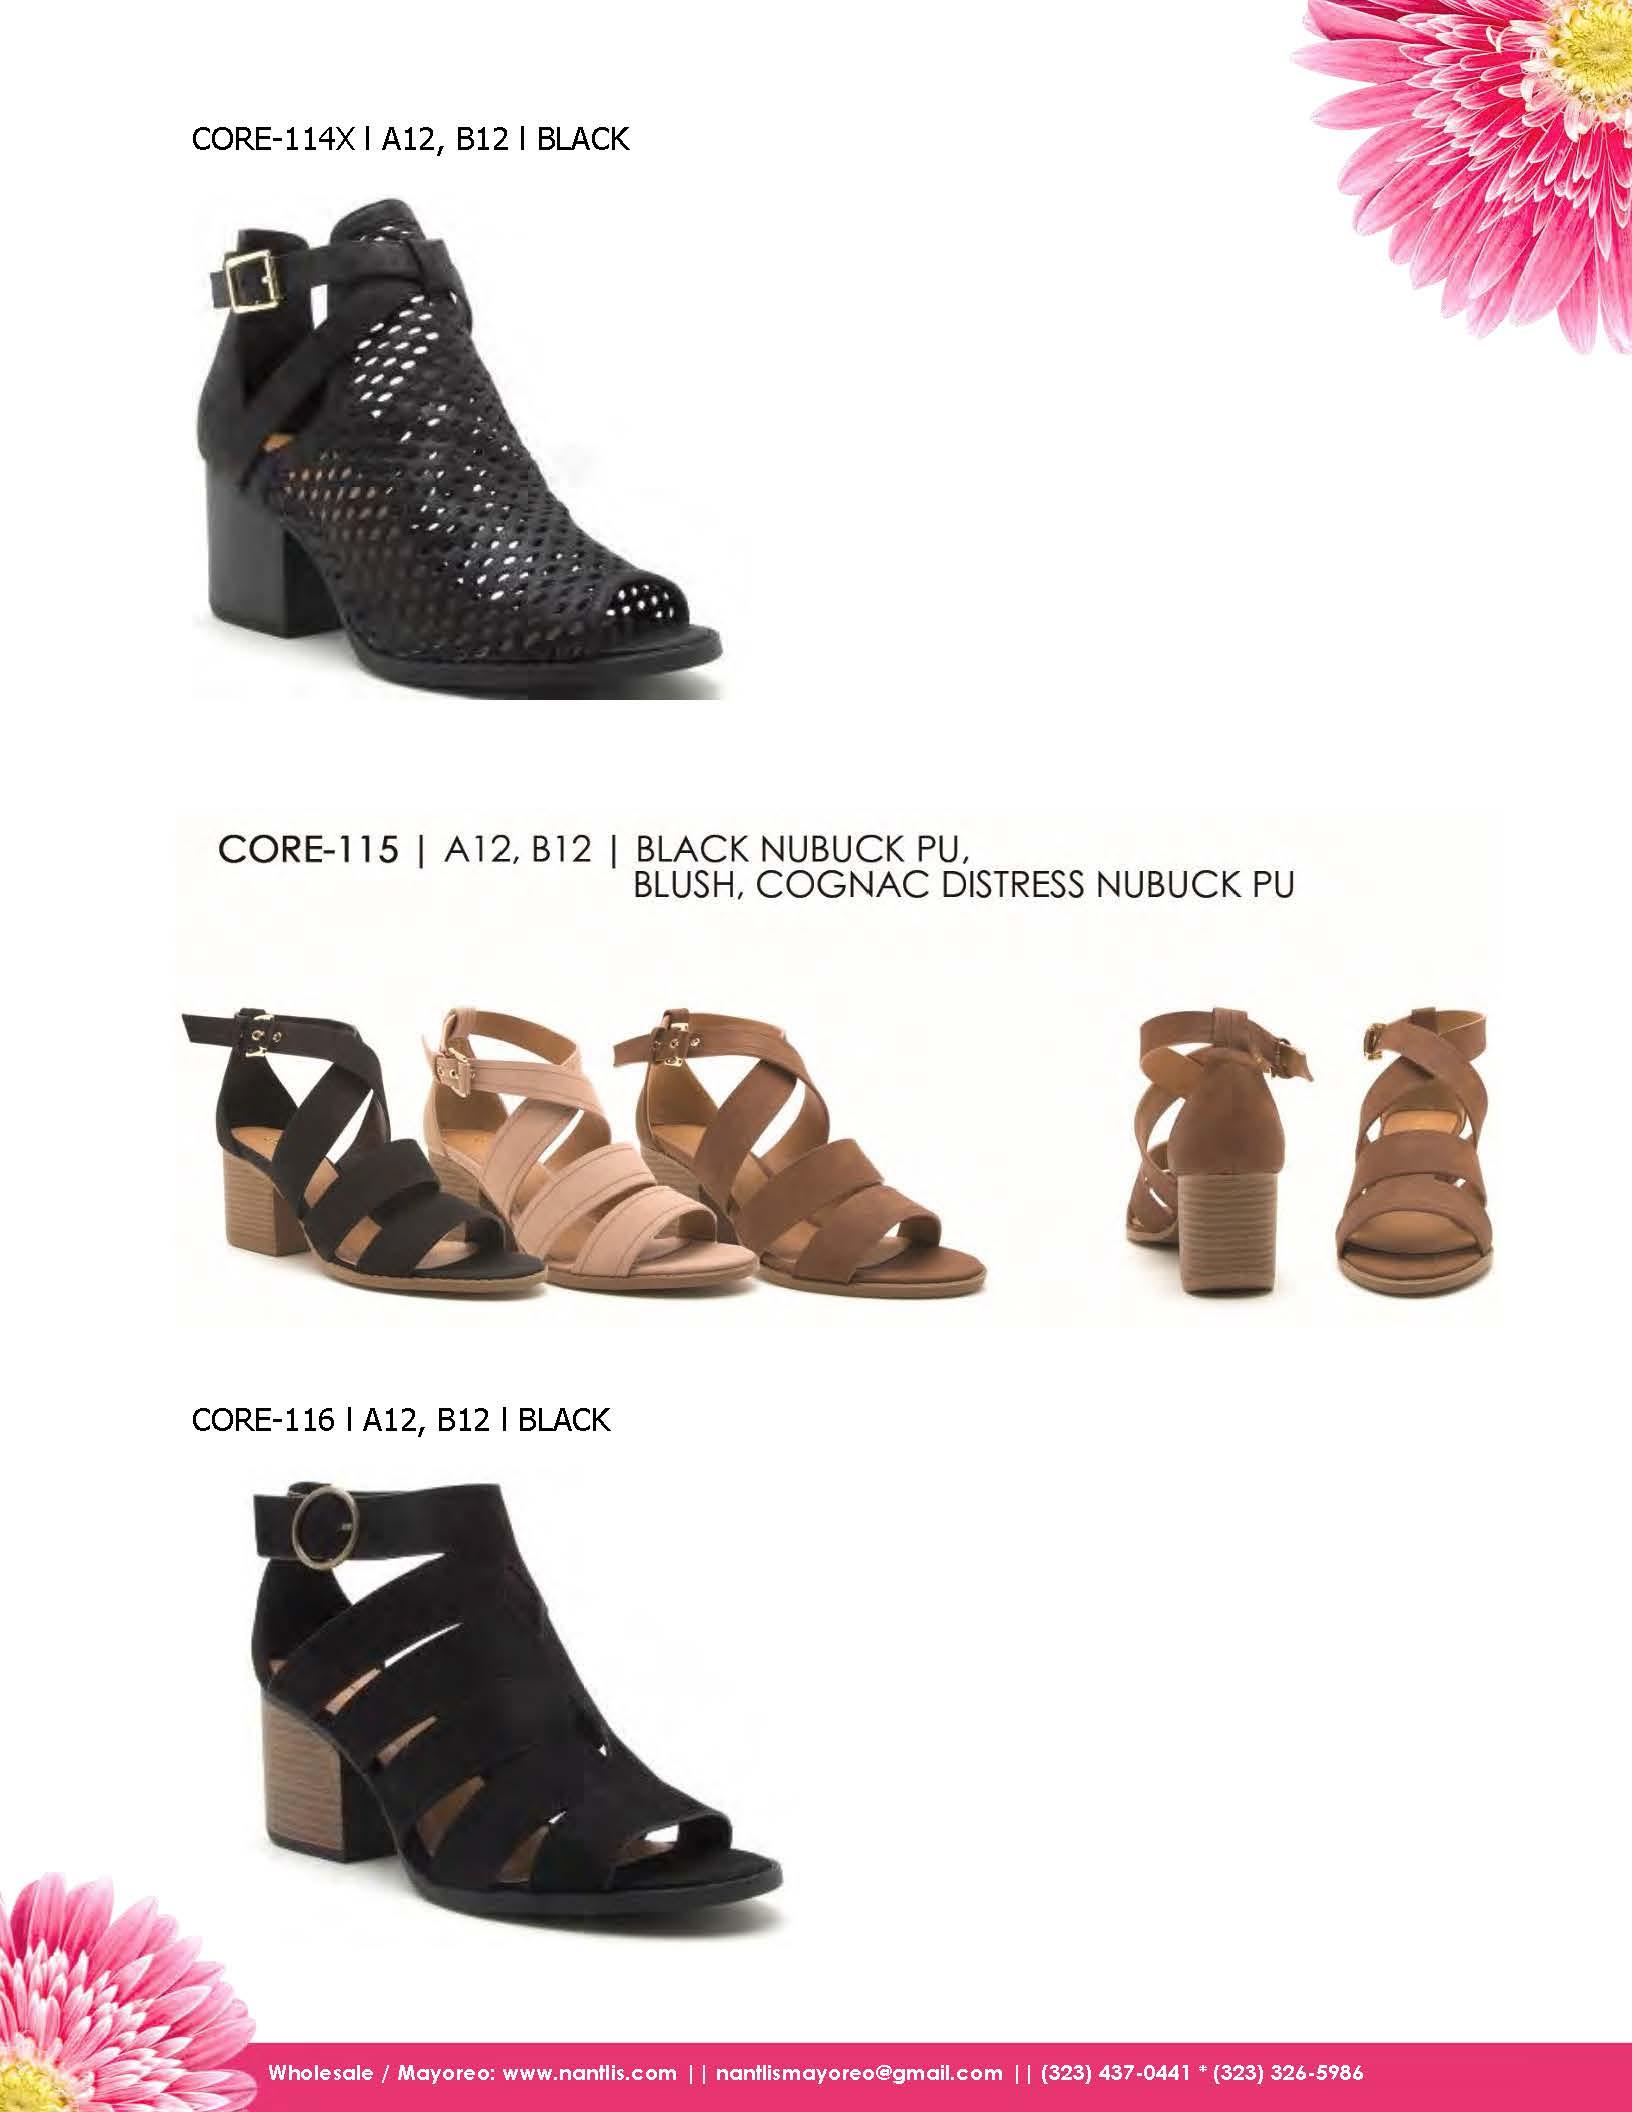 Nantlis Vol QU43 Zapatos para mujer mayoreo Wholesale shoes for women_Page_15